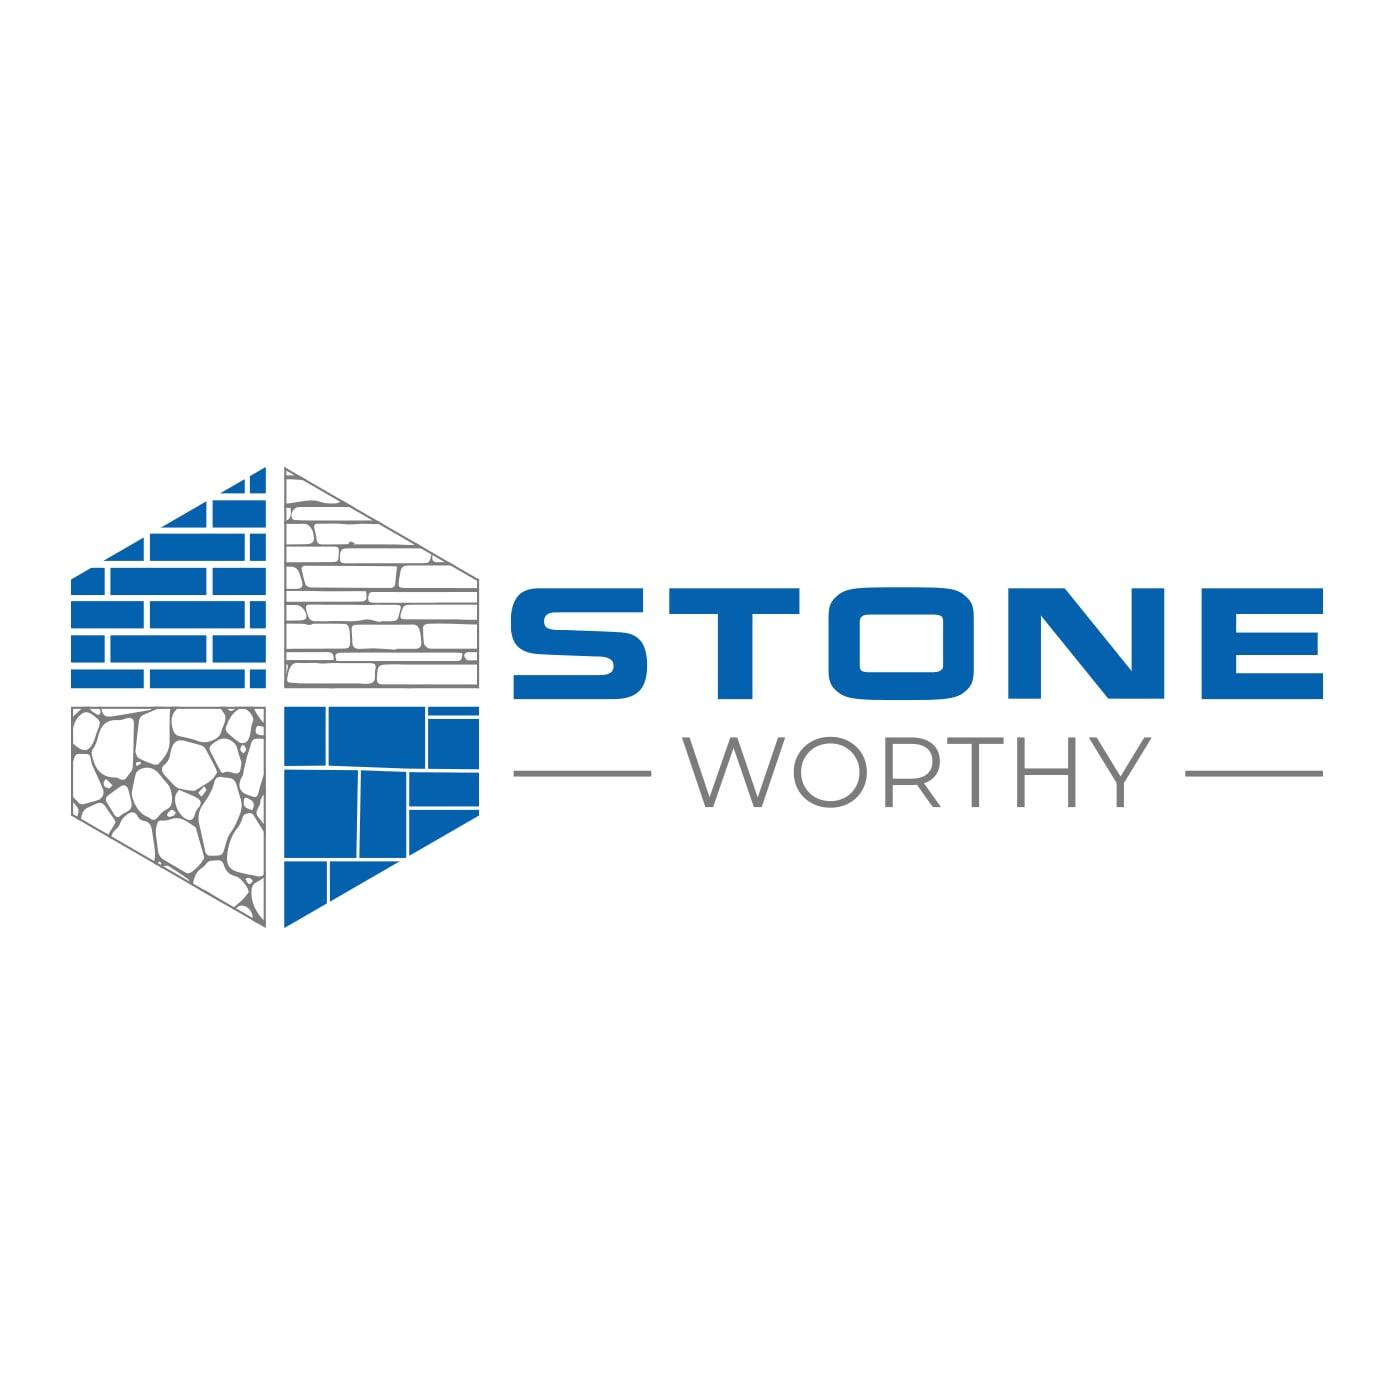 Stone Worthy